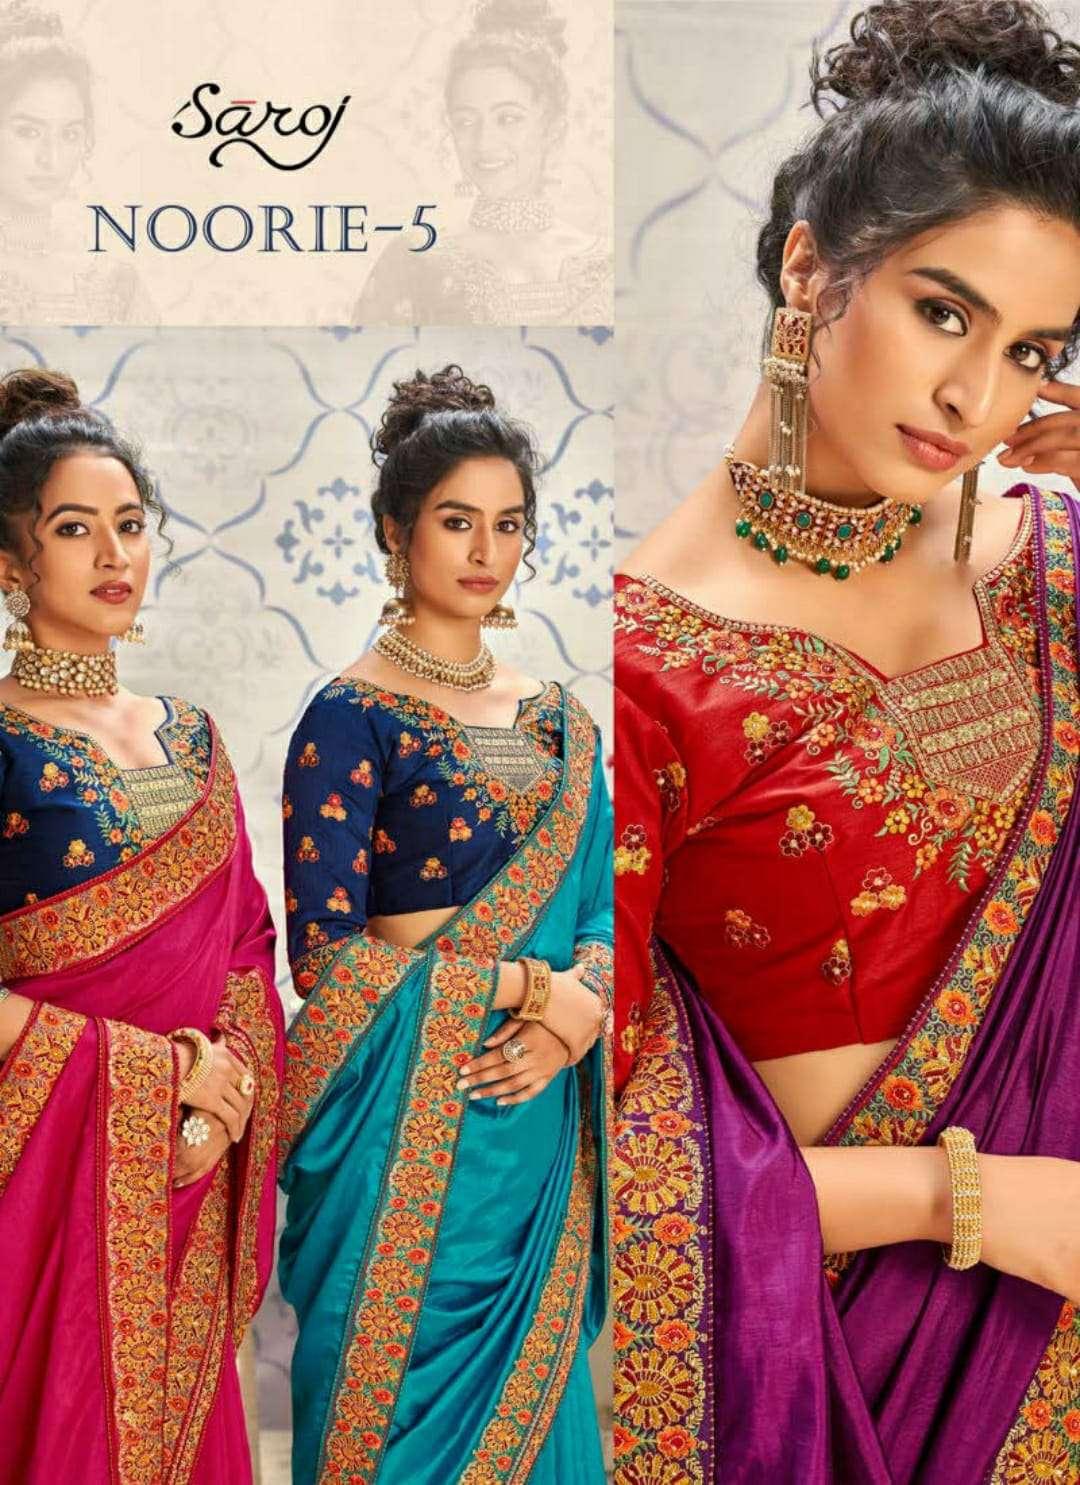 Saroj Noorie Vol 5 Dupion Silk With embroidery Work Sarees Collection